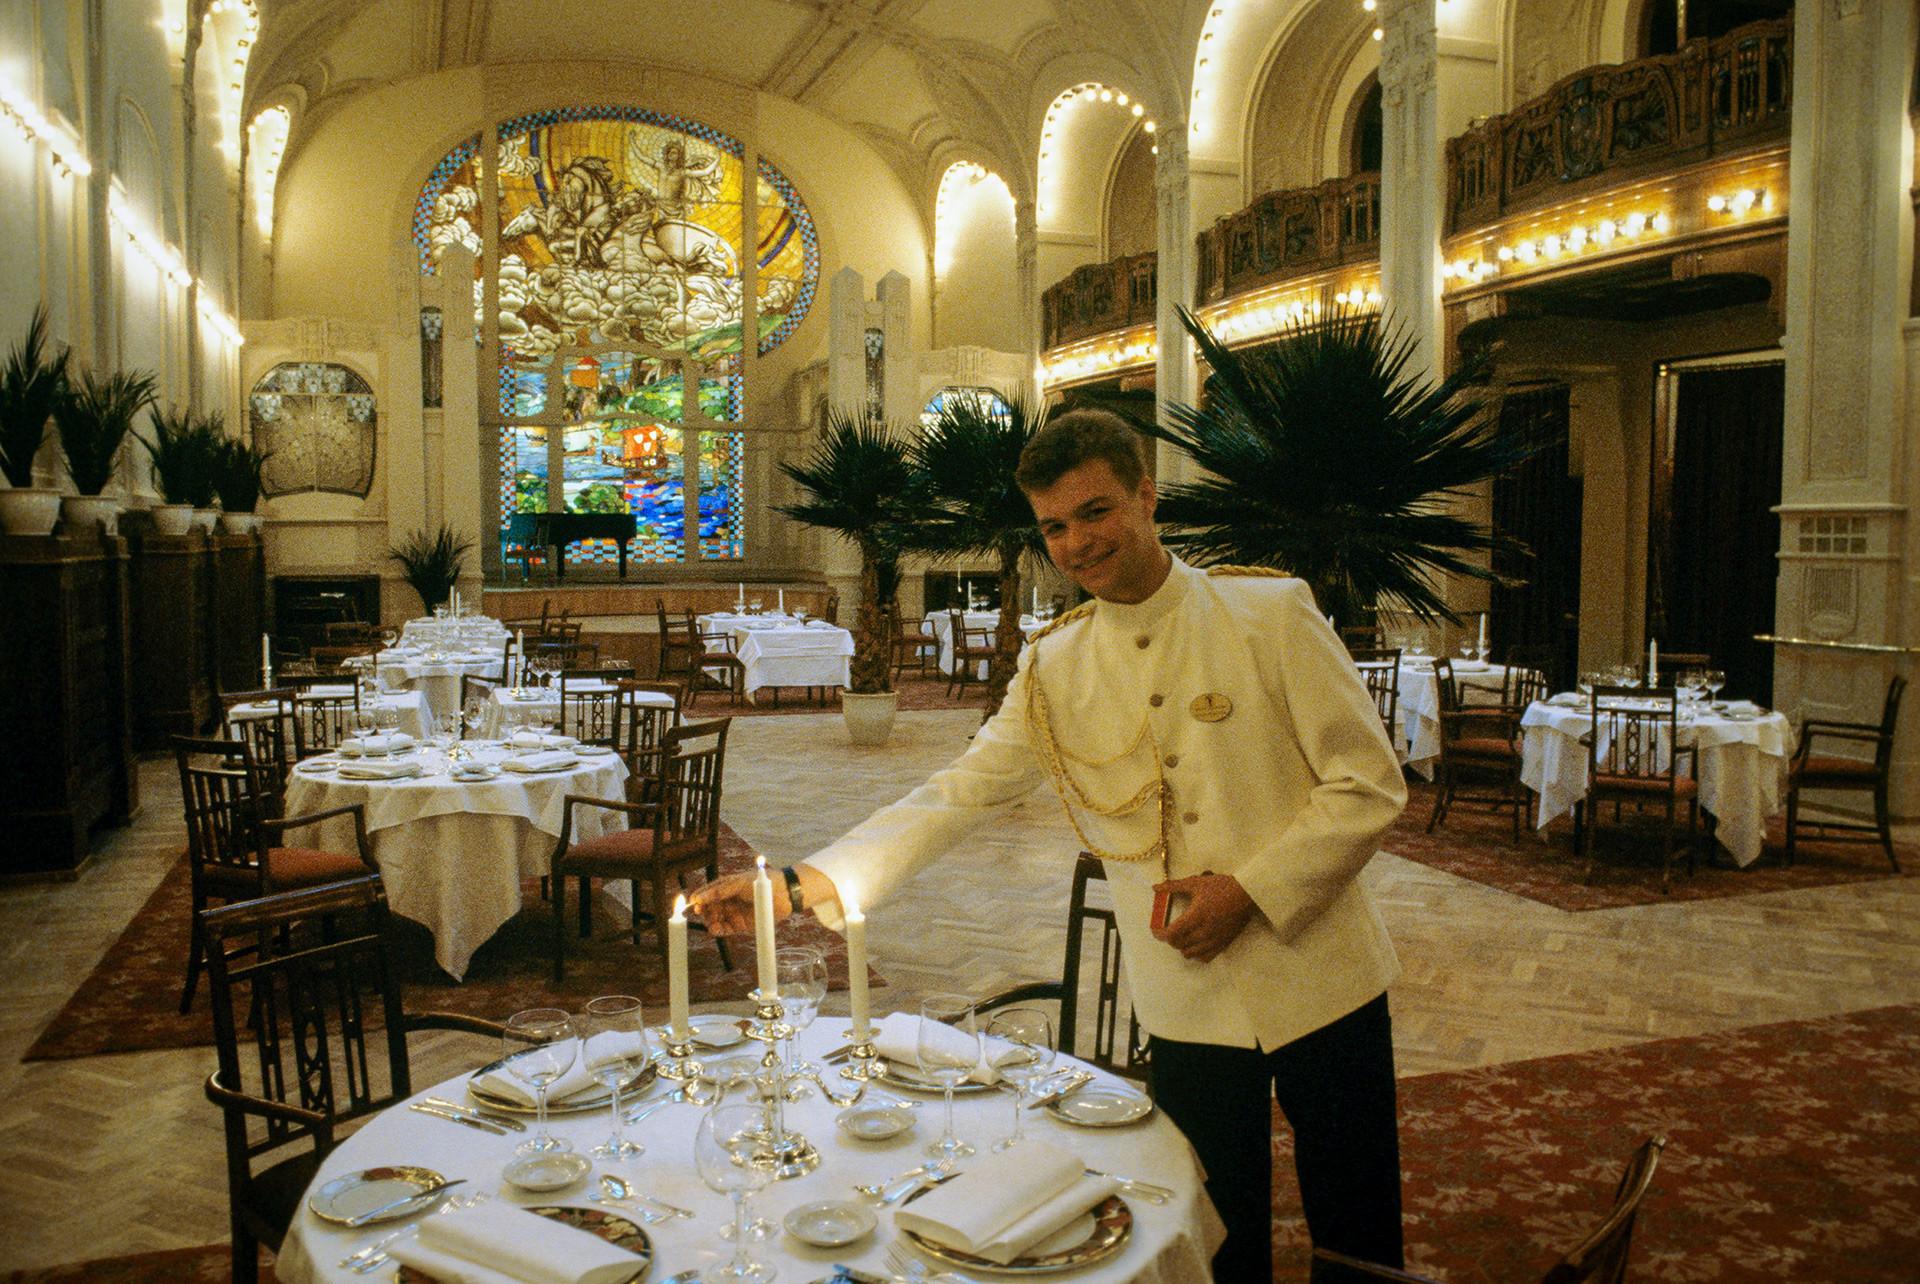 Krysha, bar yang paling eksotis dari empat restoran di Grand Hotel Eropa di bagian paling atas hotel. Para pelayan mengenakan pakaian zaman Peter I.